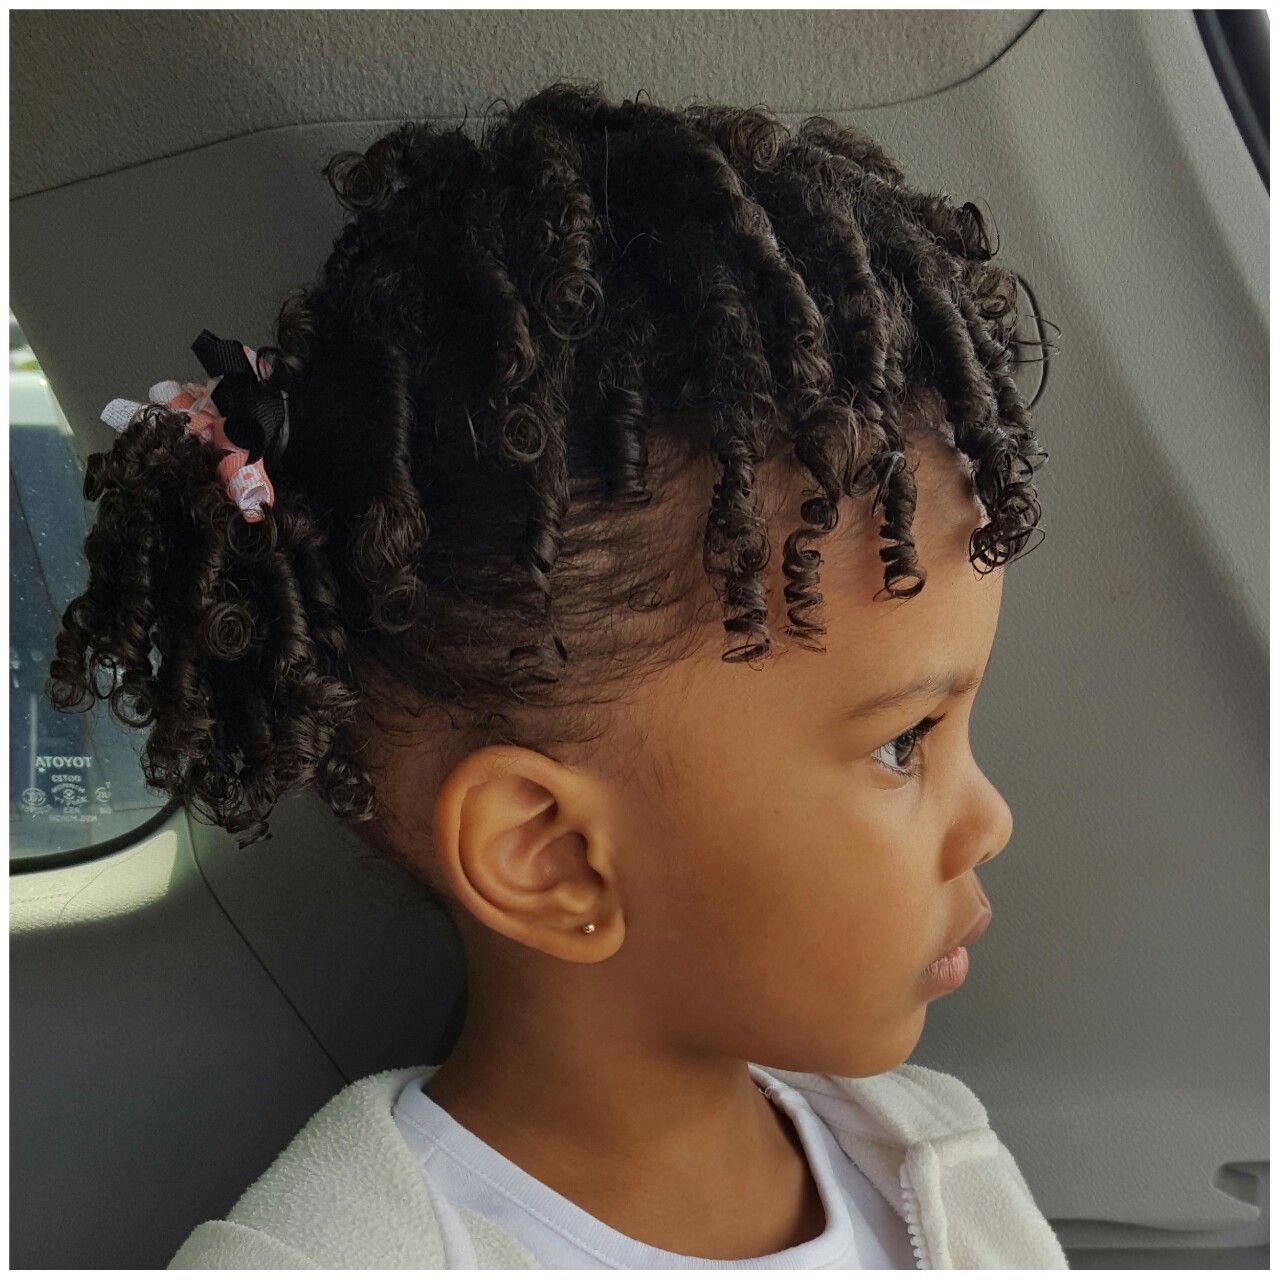 Curly Hair Toddler Hair Natural Hairstyles Curly Baby Hair Girly Hair Style Hair Styles Natural Hair Babies Toddler Hair